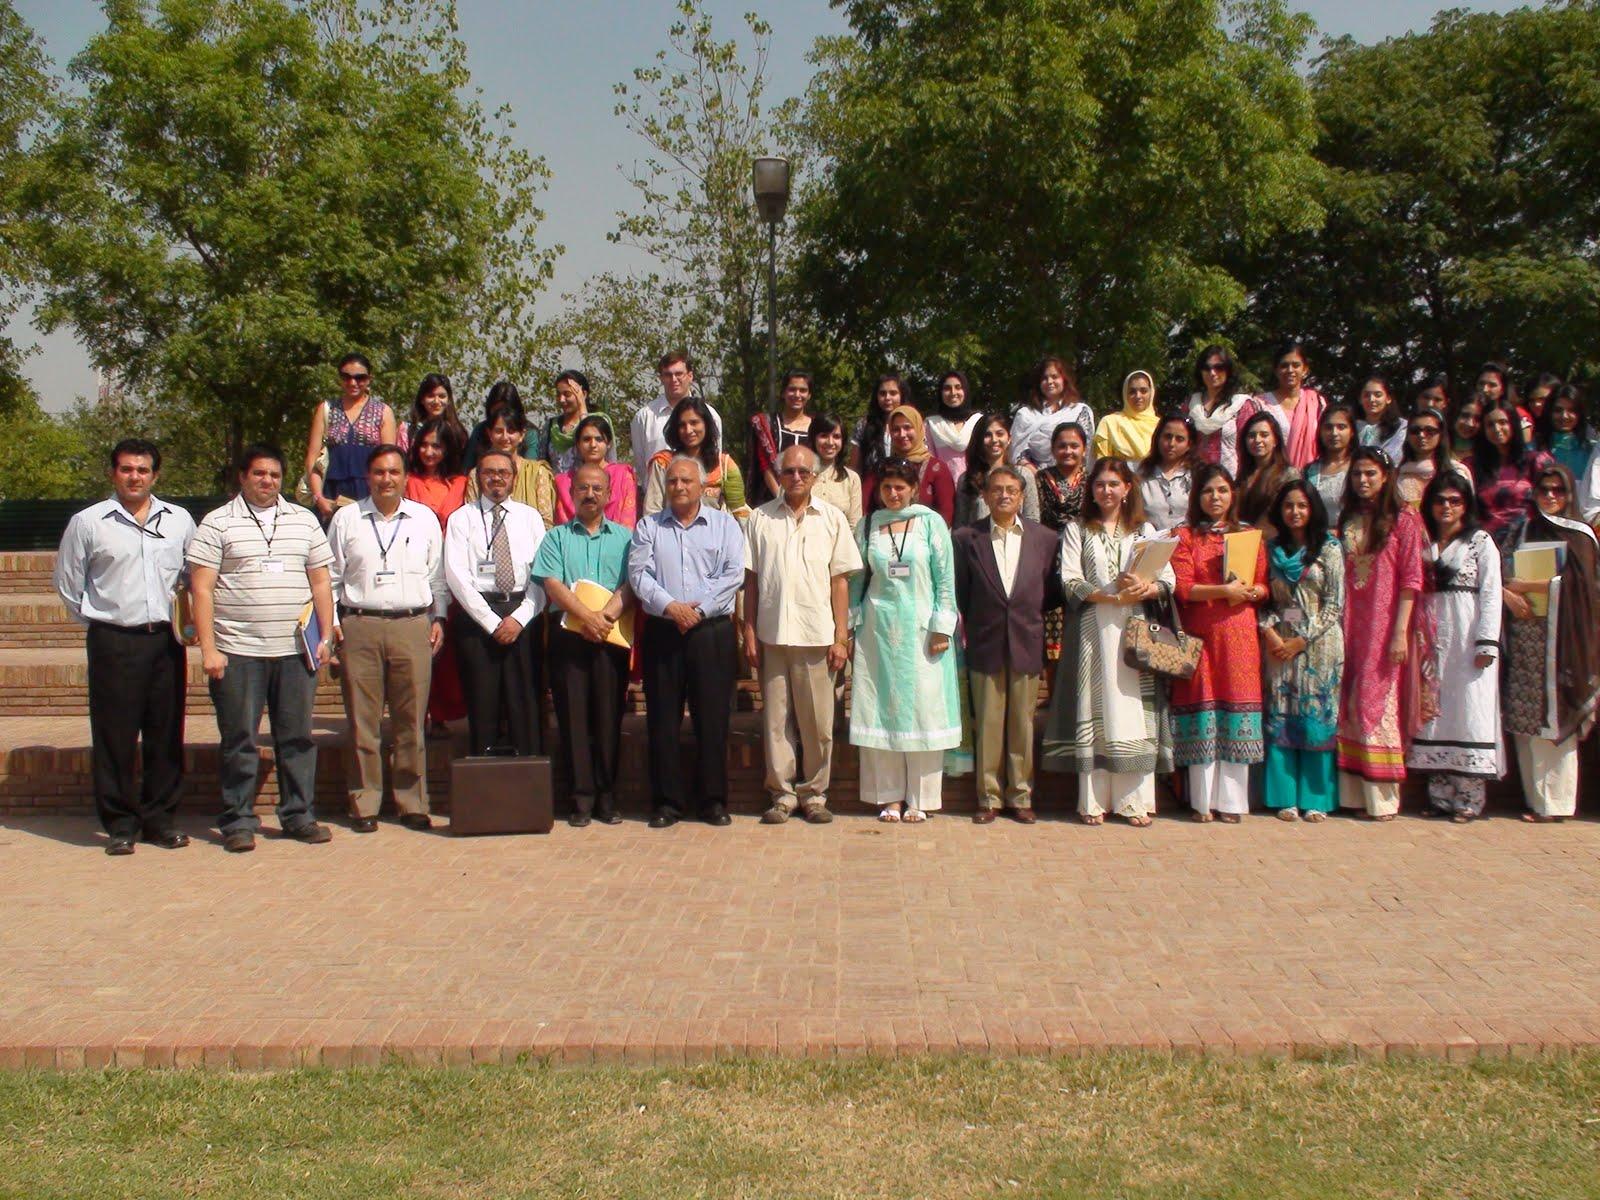 http://2.bp.blogspot.com/_skL30zwqYx8/S_ERKQiRiNI/AAAAAAAAArs/hTpiHIMEsEU/s1600/Lahoreschoolofeconomics.JPG